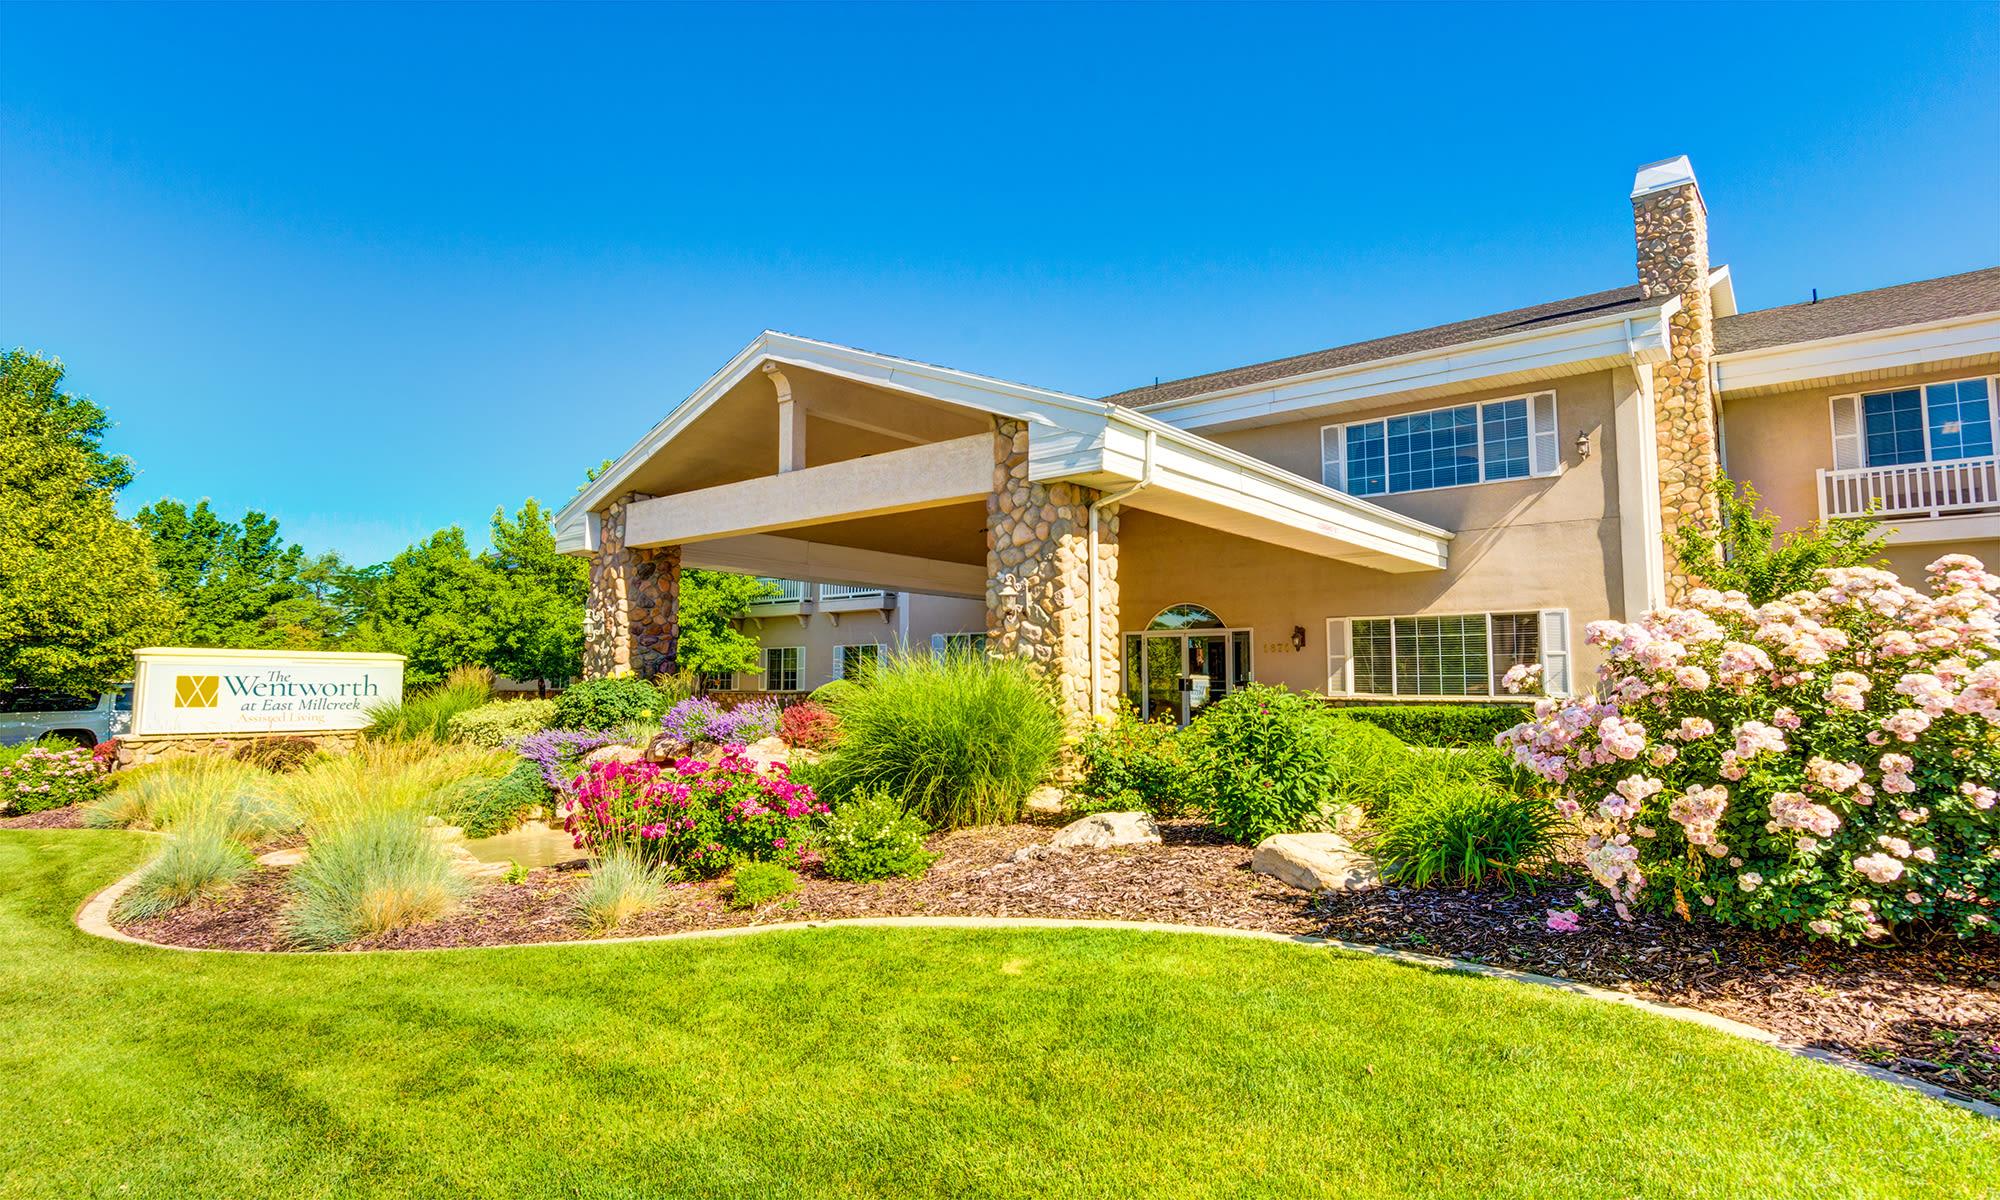 Senior living community in Salt Lake City has a clean exterior building